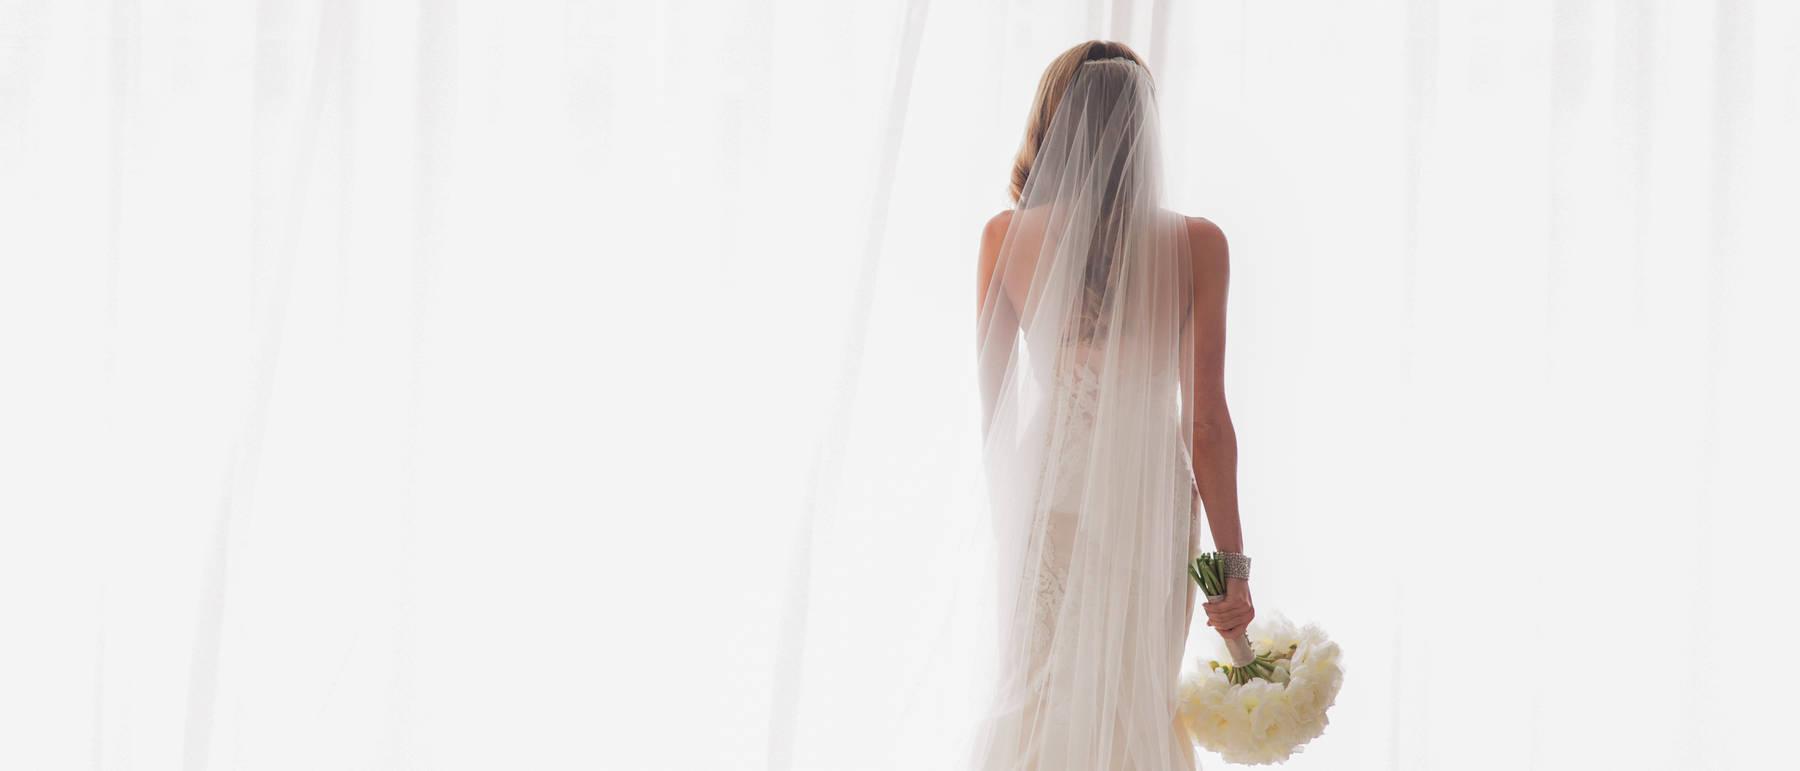 johnandjoseph-wedding-photographer-hz-slider-101